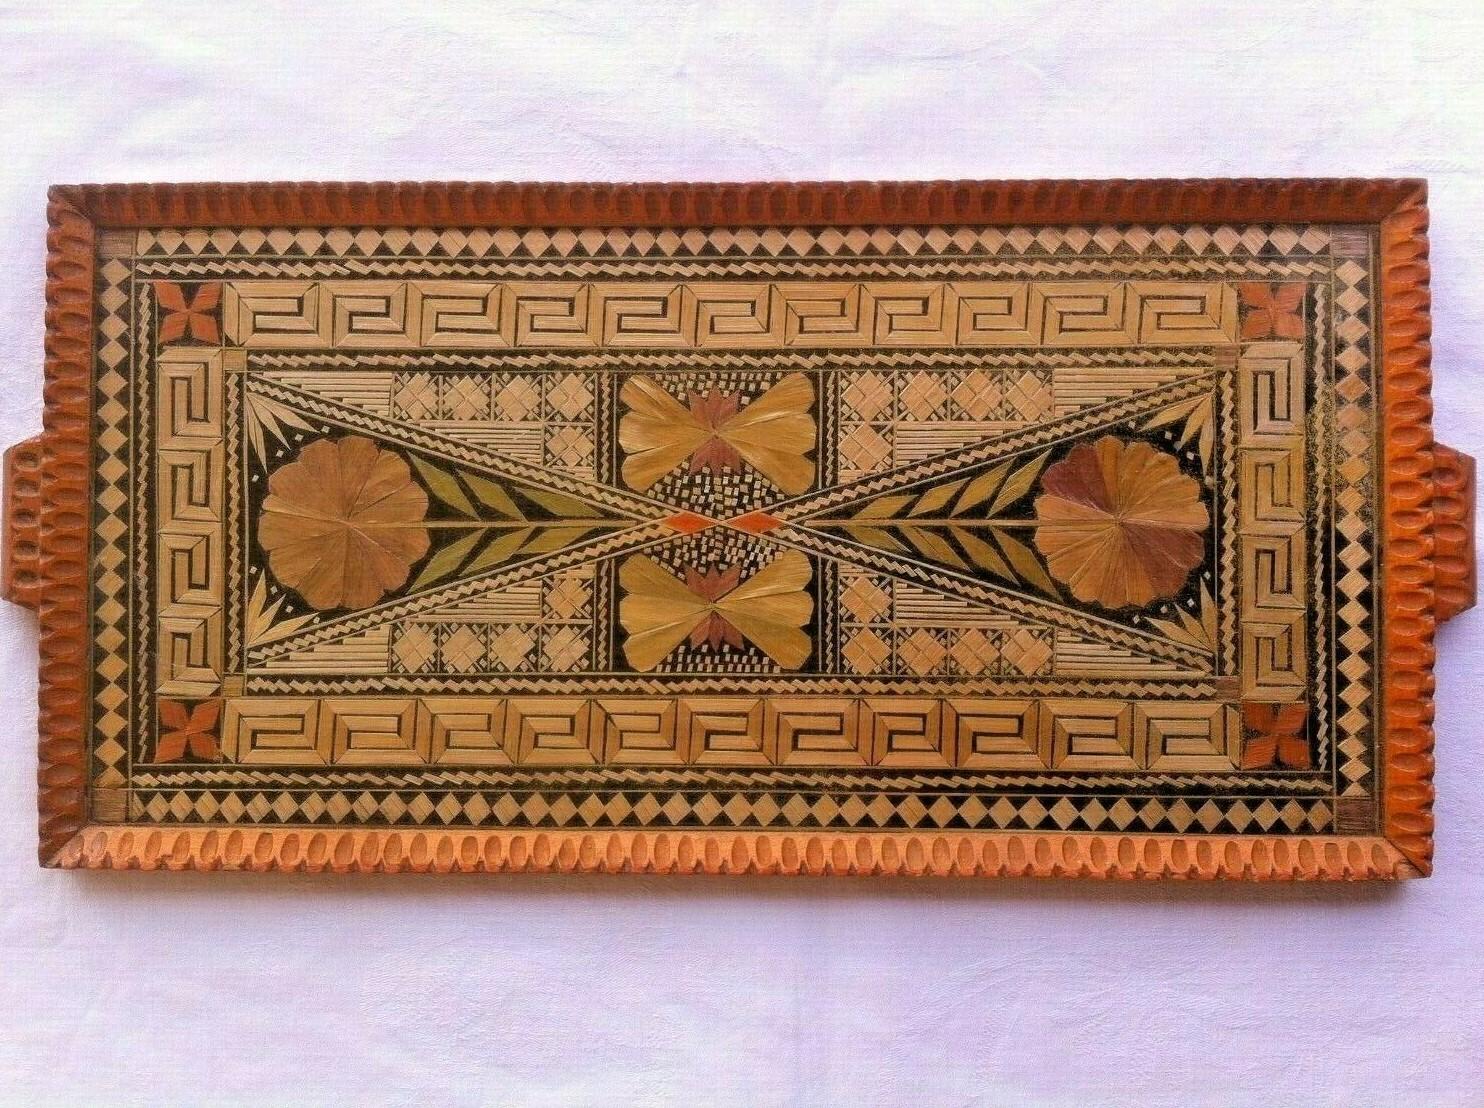 eBay, Greek Straw Tray, Greek prisoner, prisoner art, The Straw Shop